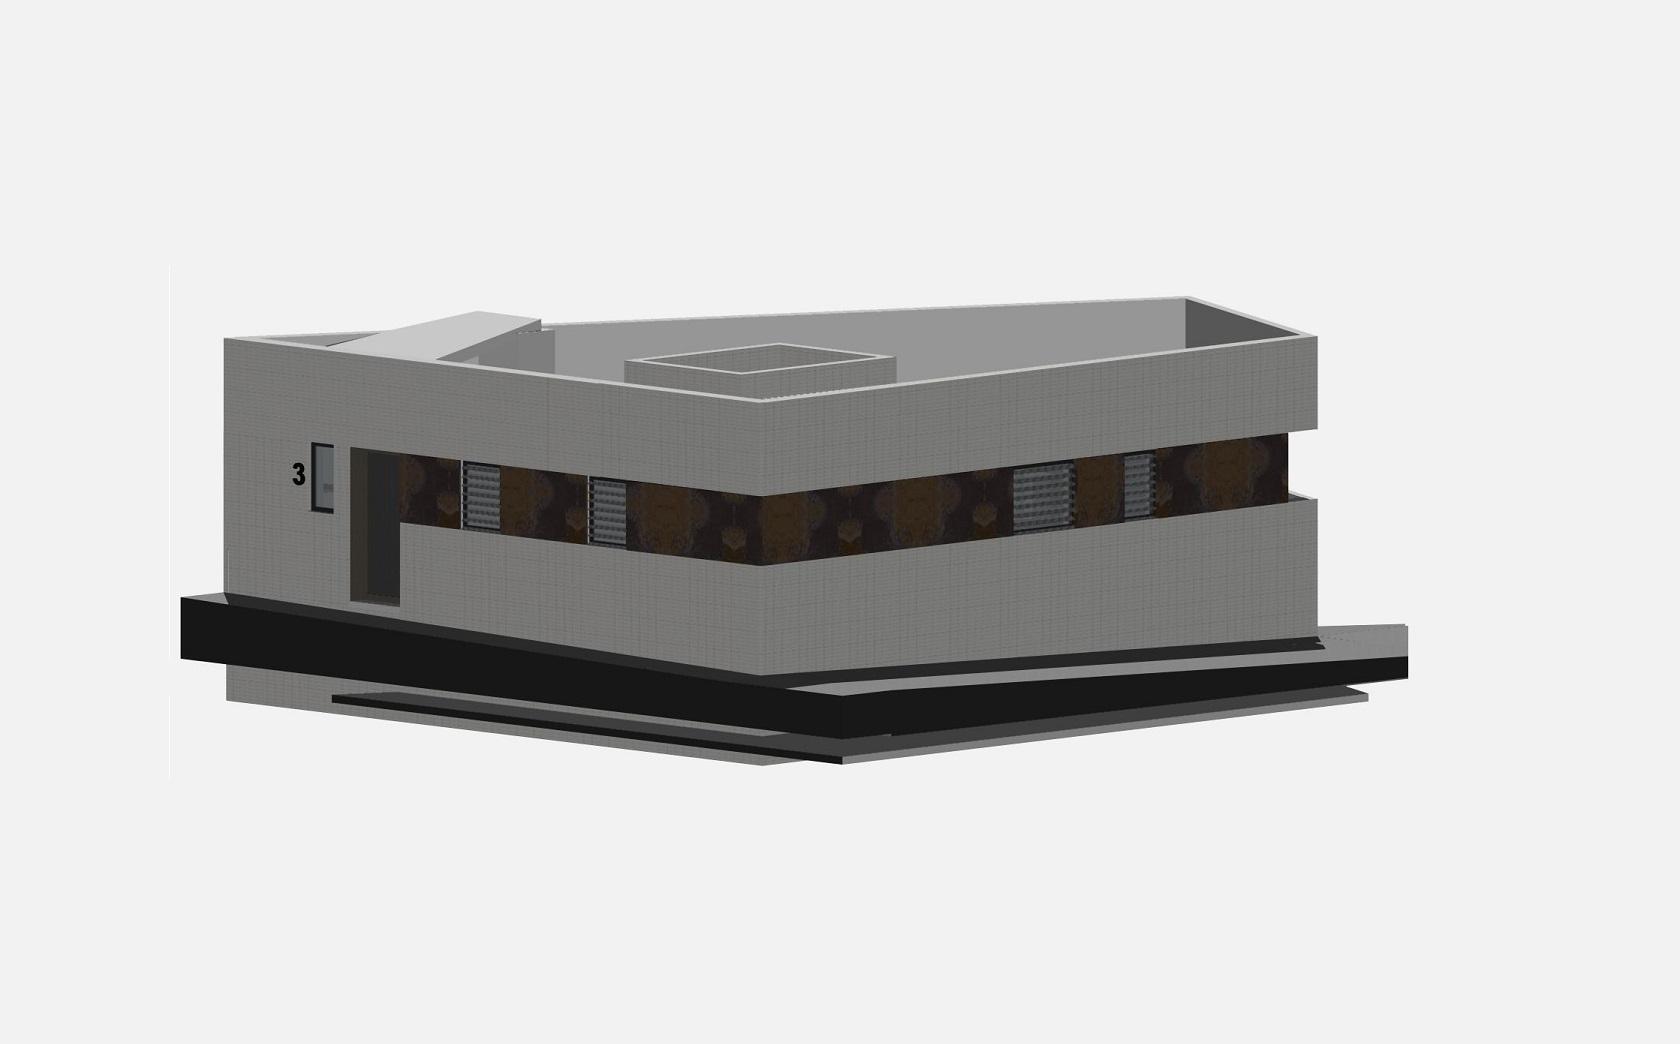 Proyecto Casa Pasiva - Pro Haus